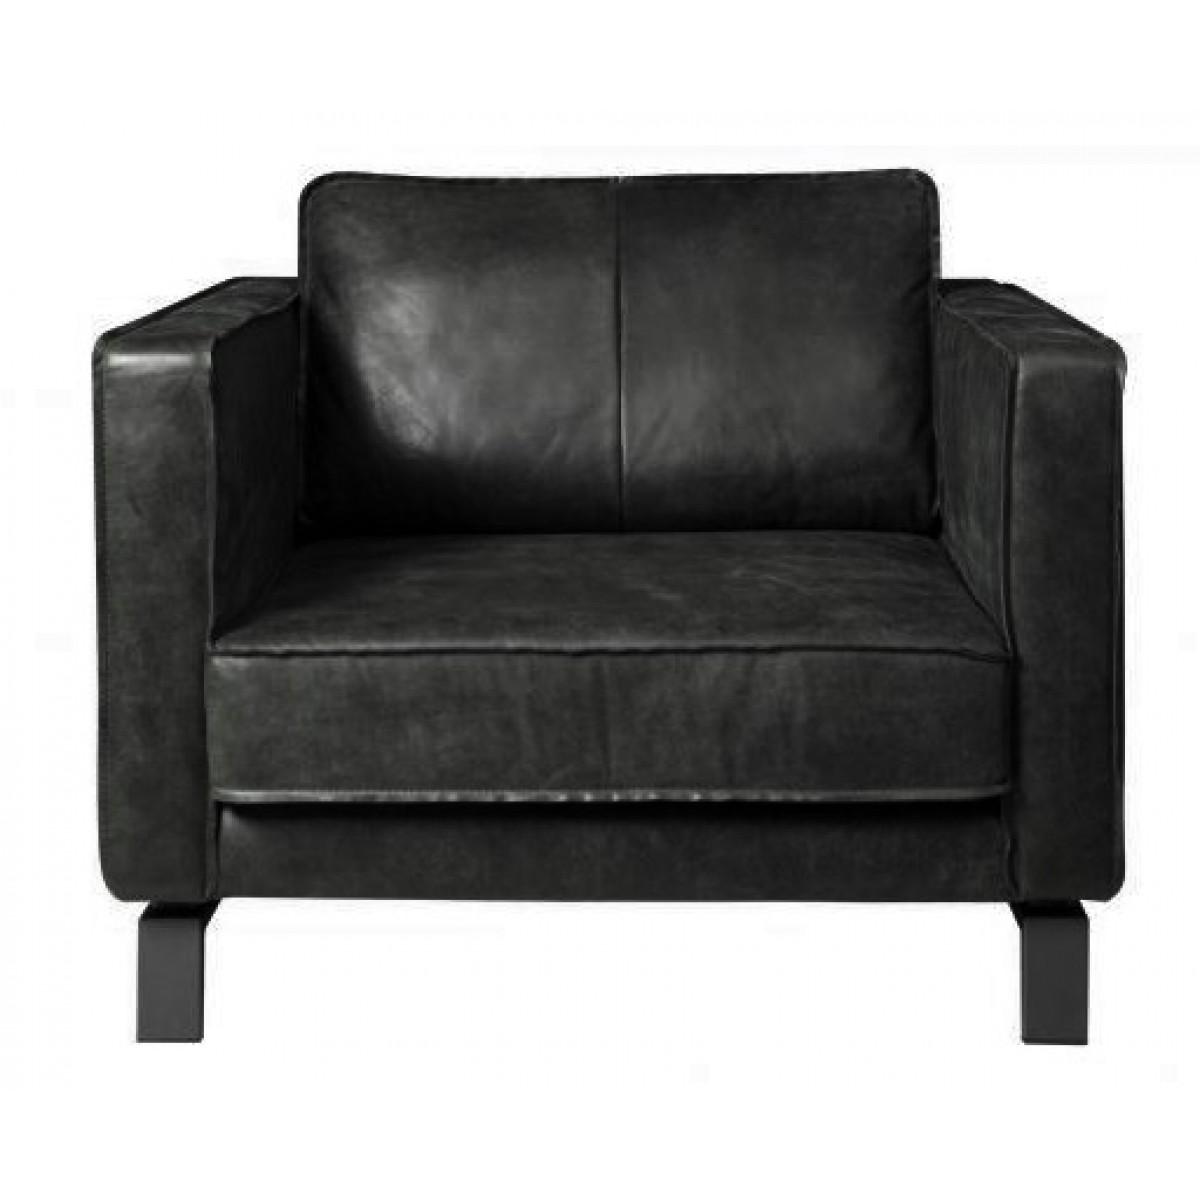 boris-fauteuil-loveseat-1zits-1,5zits-leder-walnut